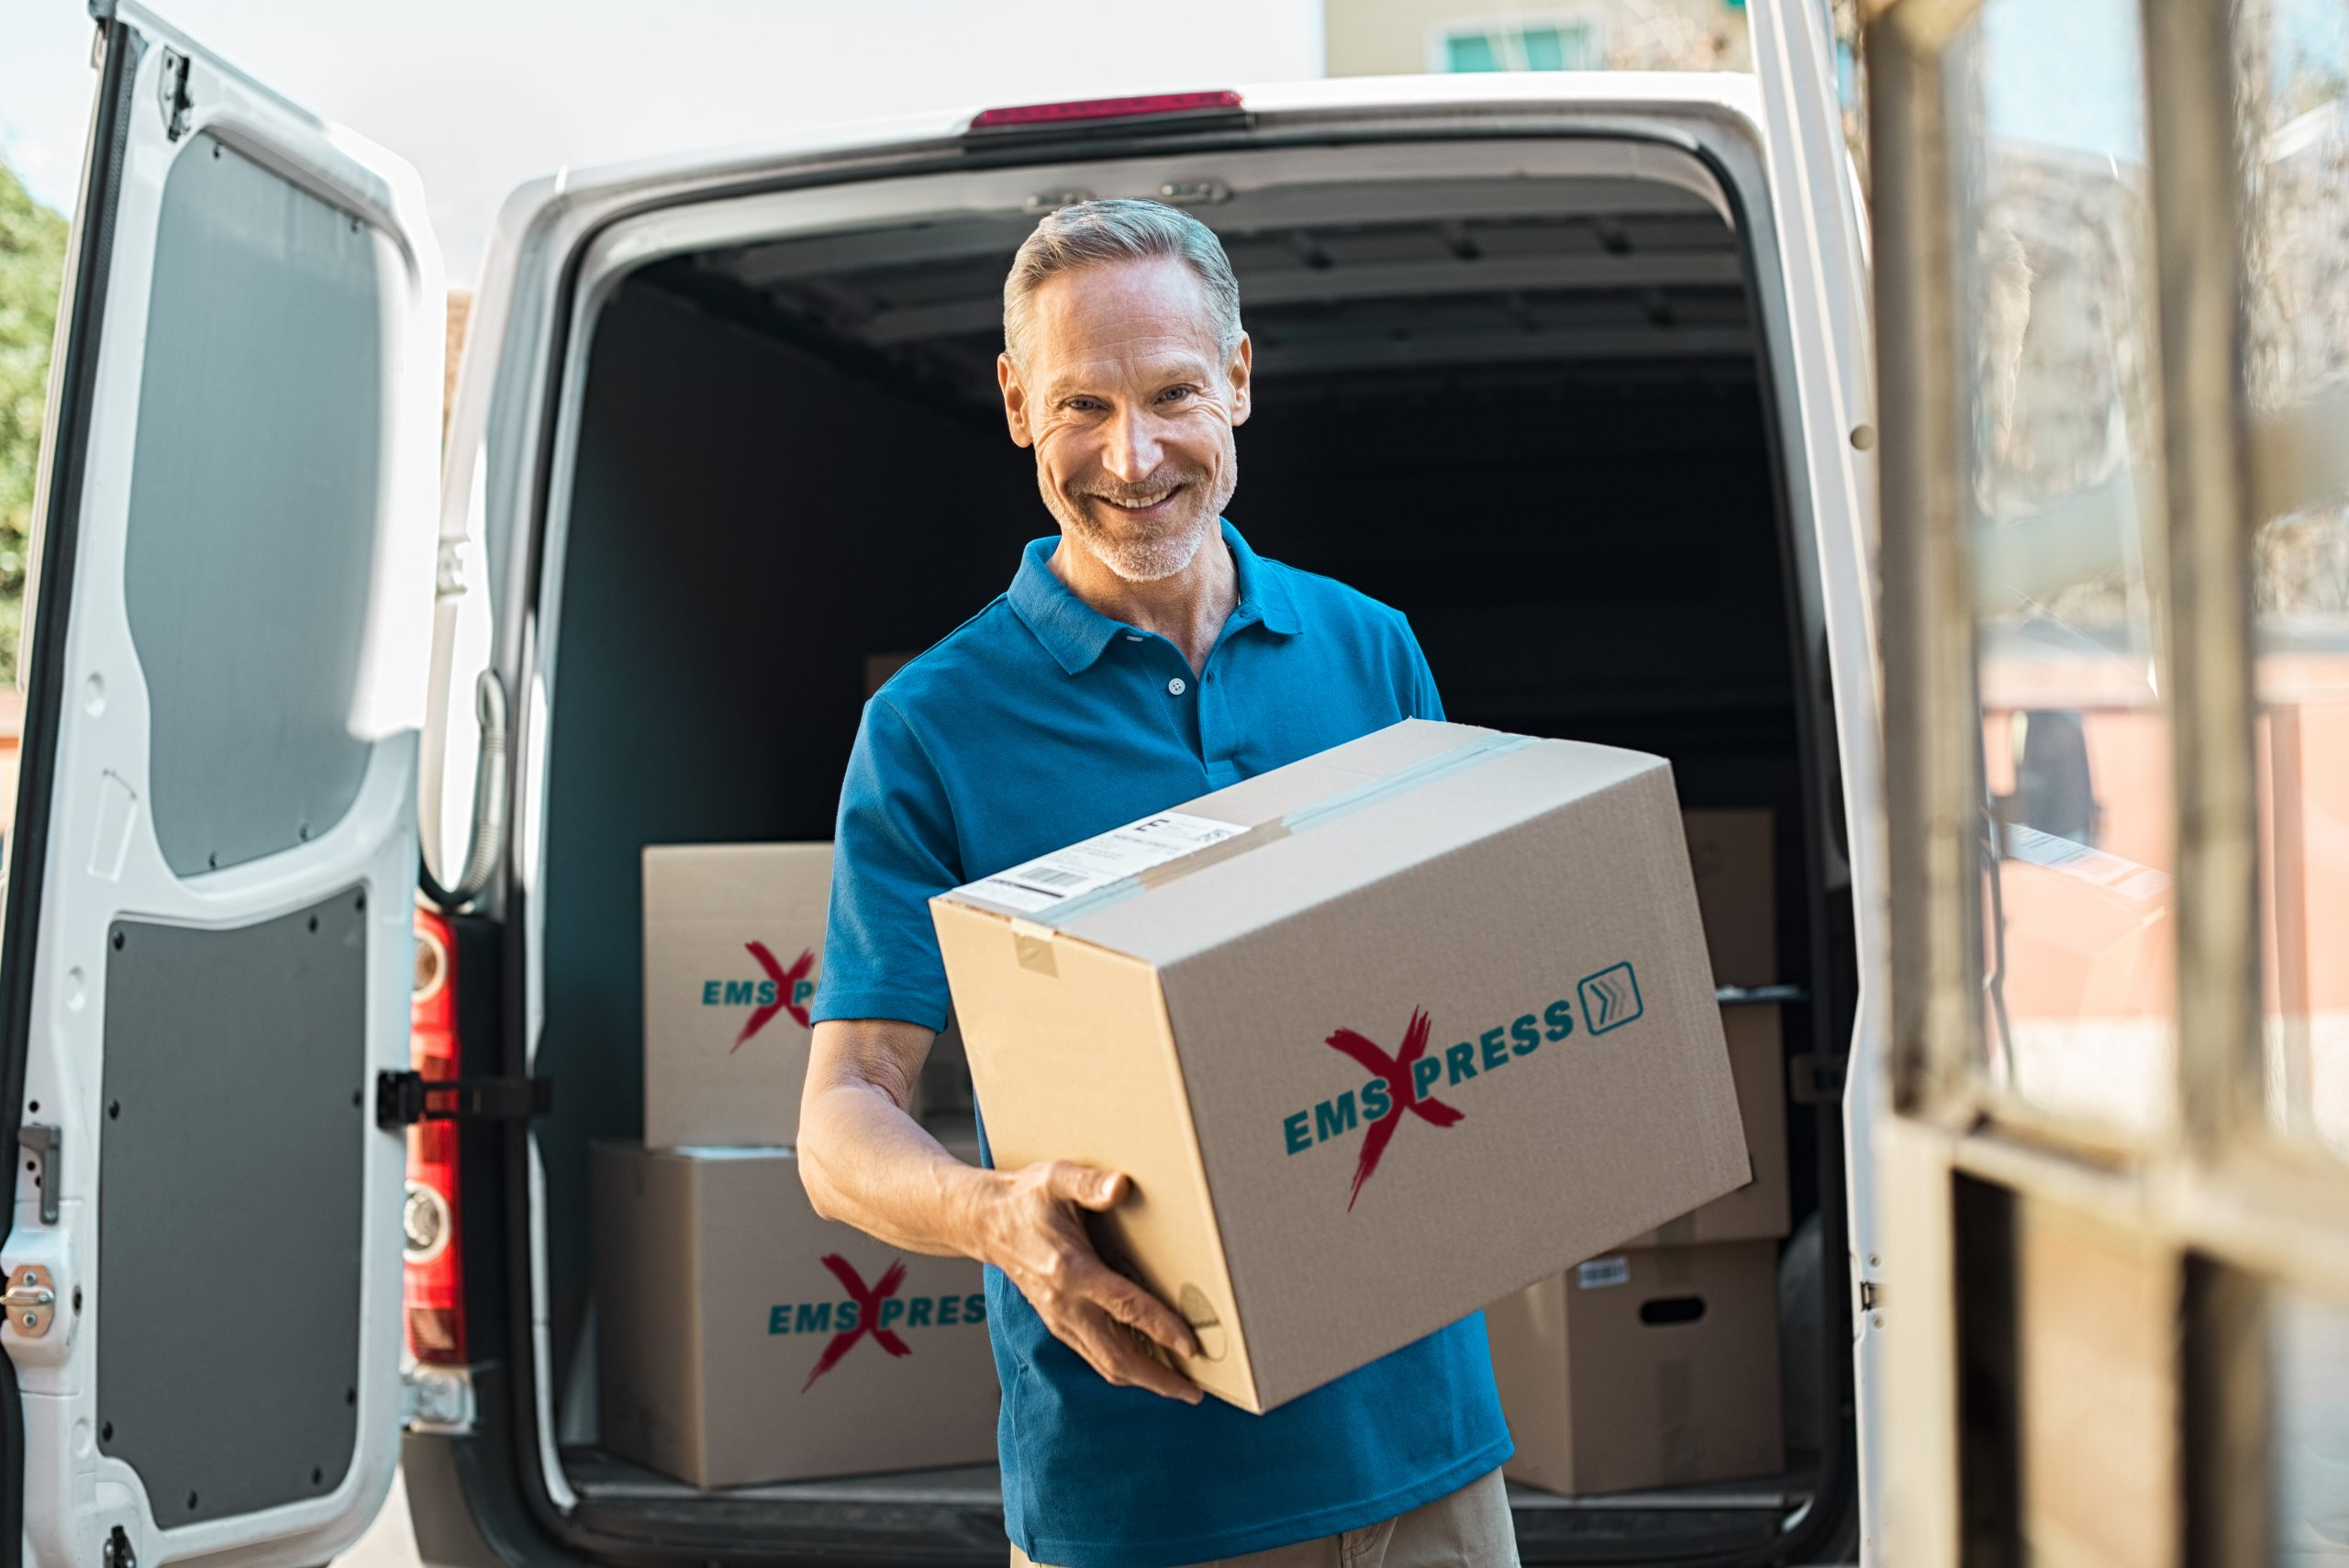 Delivery man holding parcel